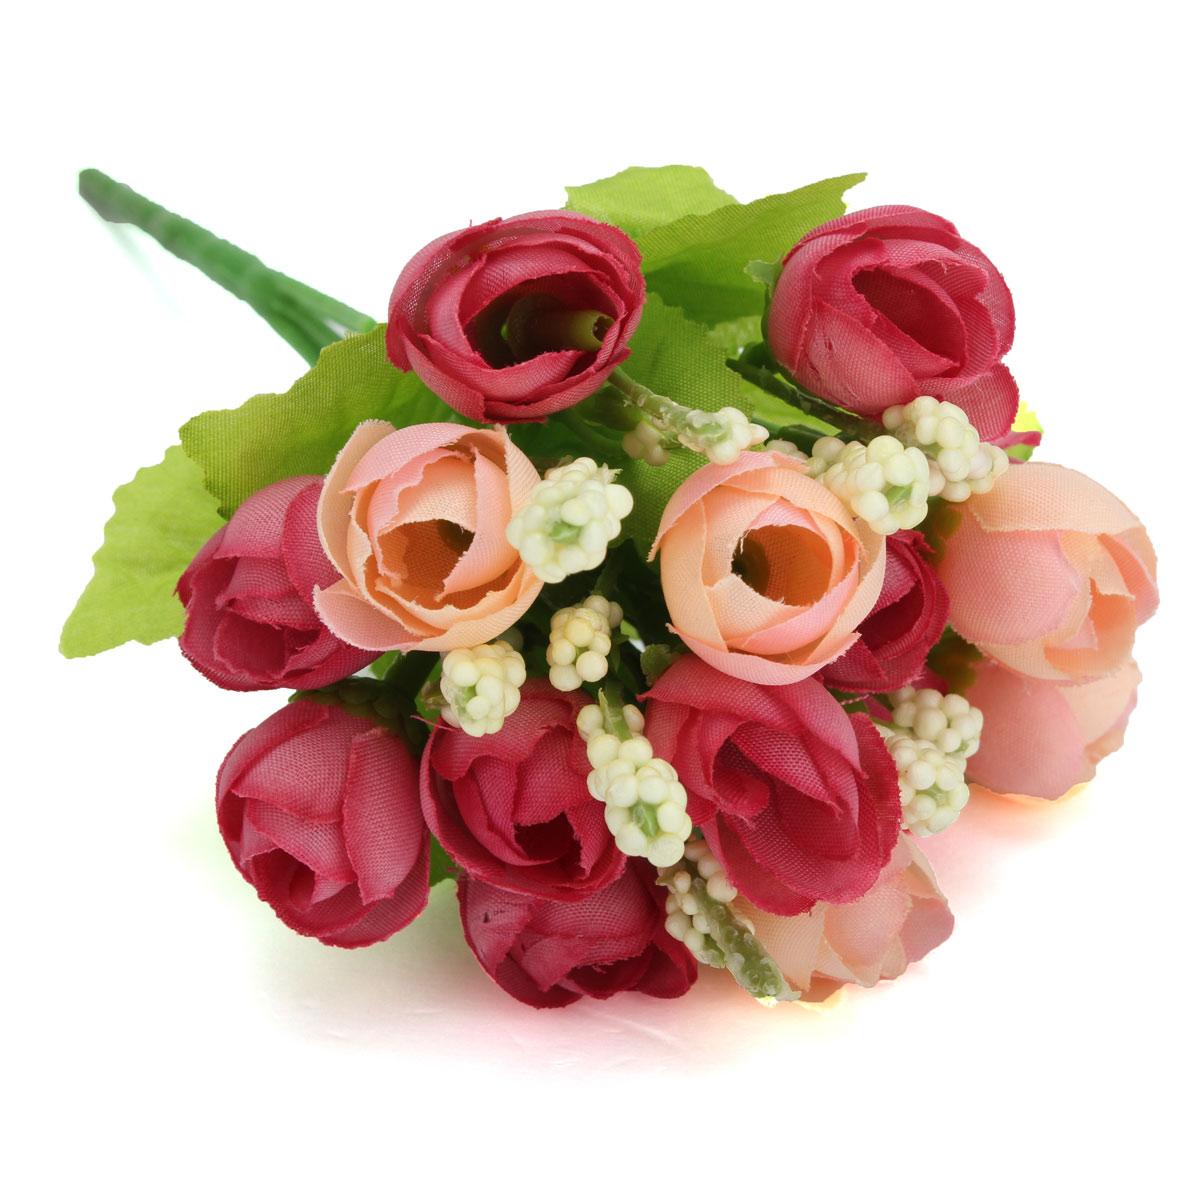 Online get cheap home bouquet wedding party aliexpress 5 colors silk bouquet artificial rose flower home garden wedding living room office decoration diy party izmirmasajfo